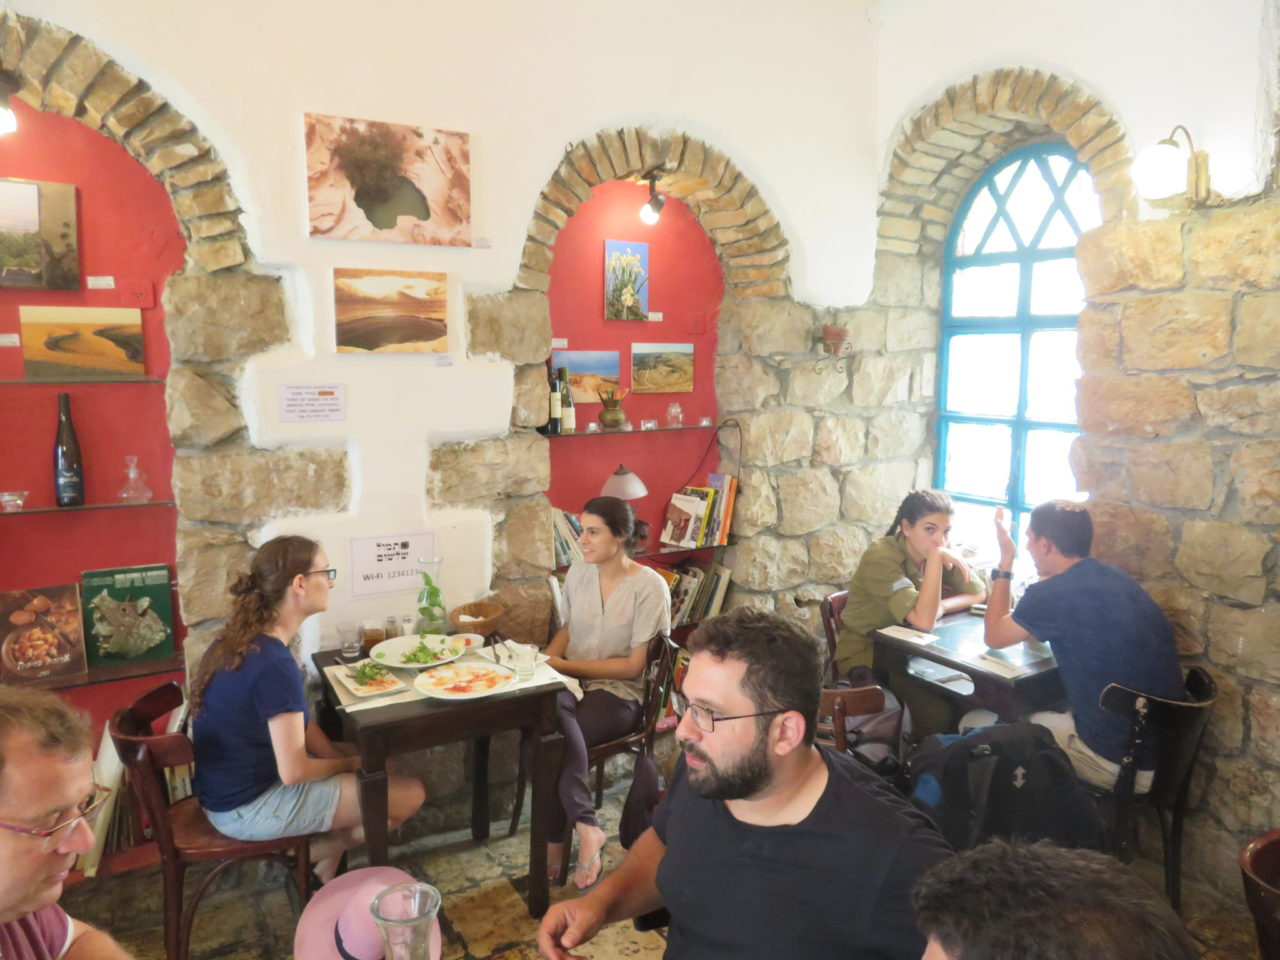 The joys of walking Jerusalem - A corner of the Tmol Shilshom literary cafe and restaurant